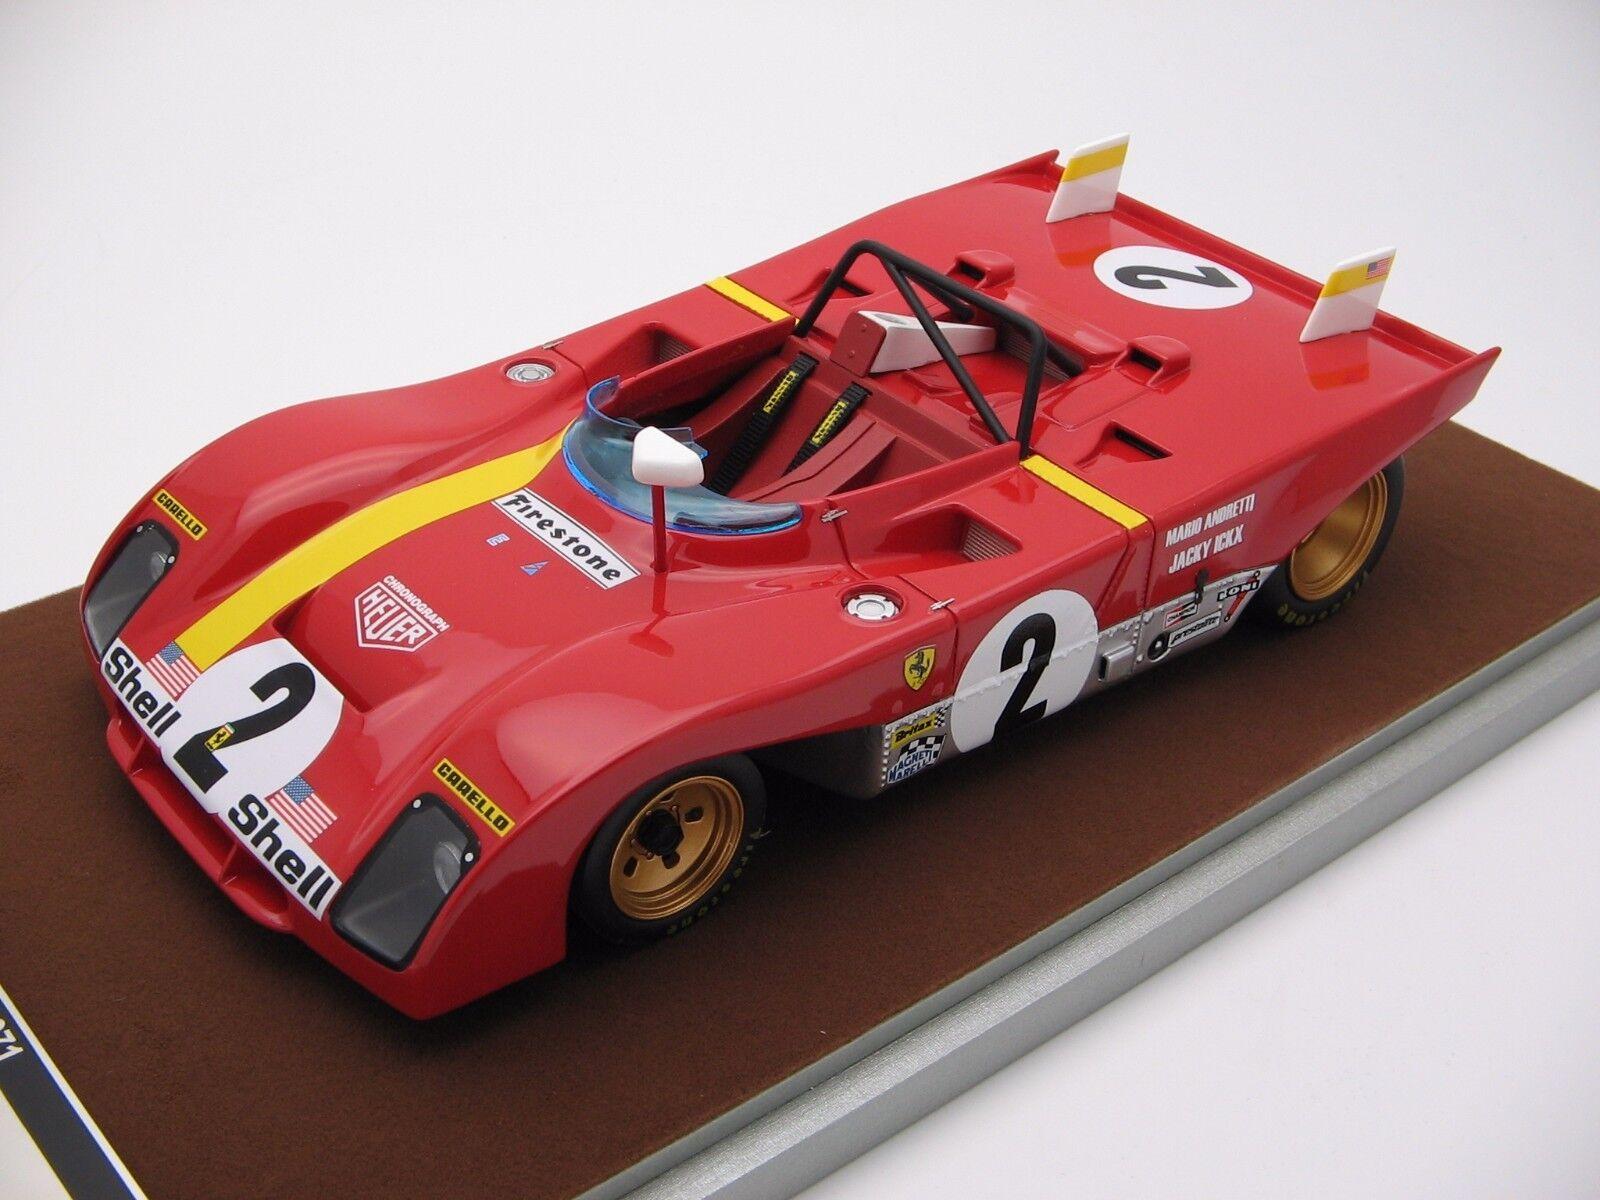 1/18 scale Tecnomodel Ferrari 312PB Daytona 24 Winner 2018 TM18-61B